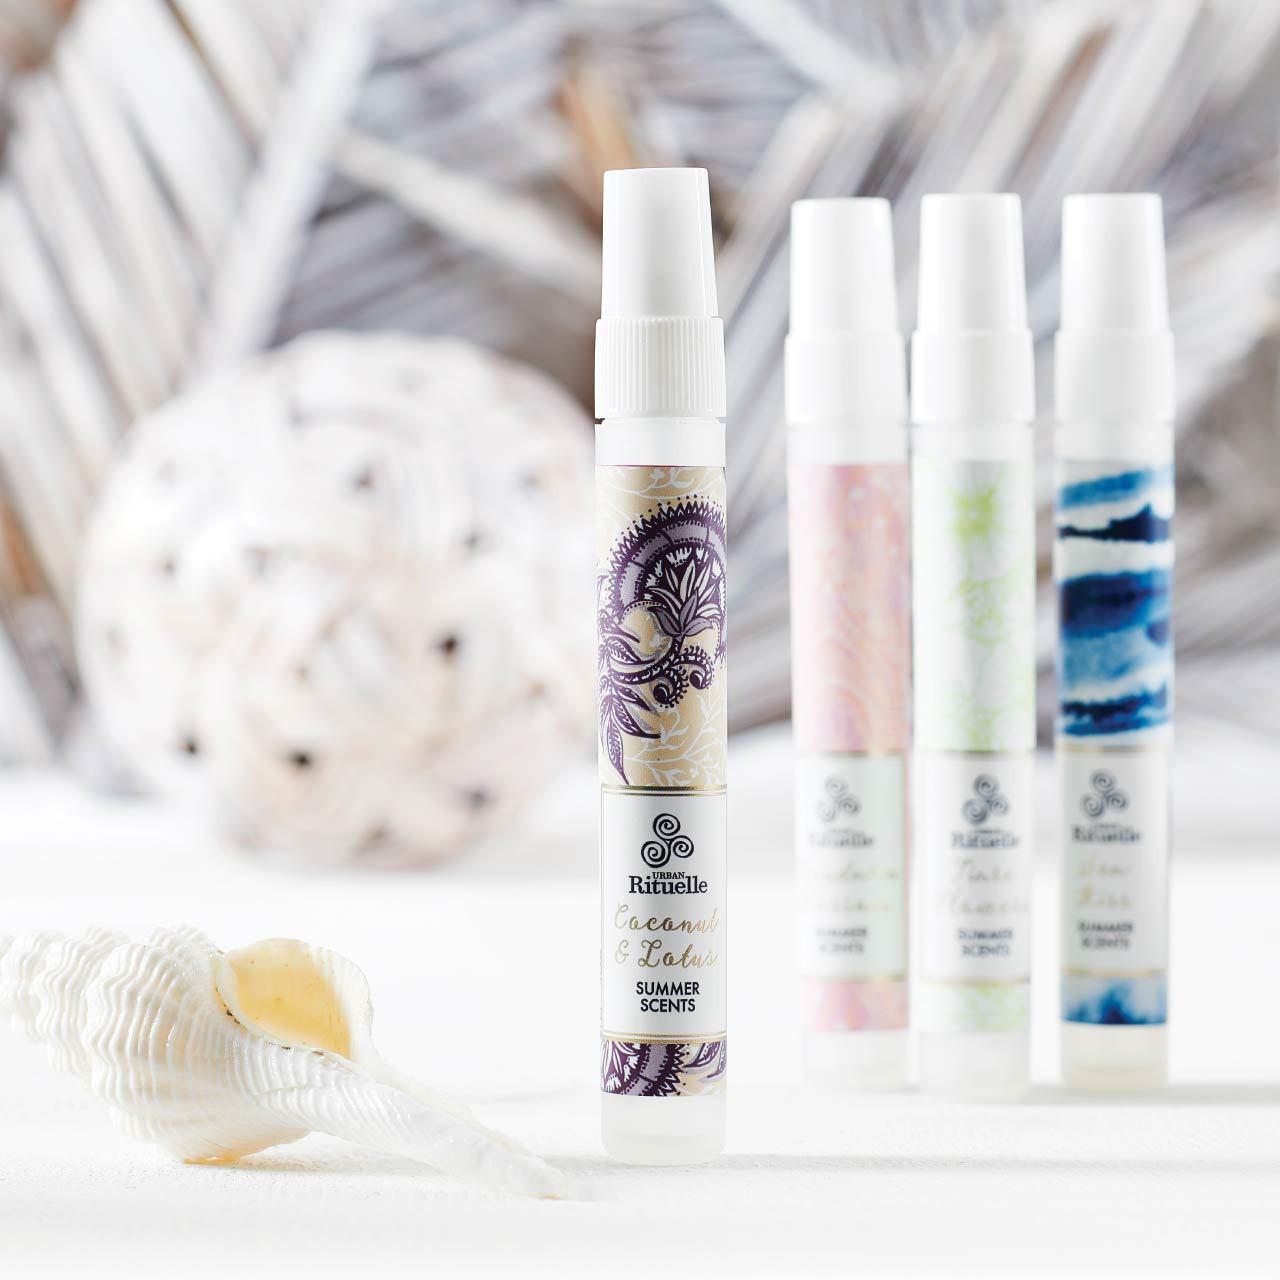 Summer Scents Perfumes- Urban Rituelle